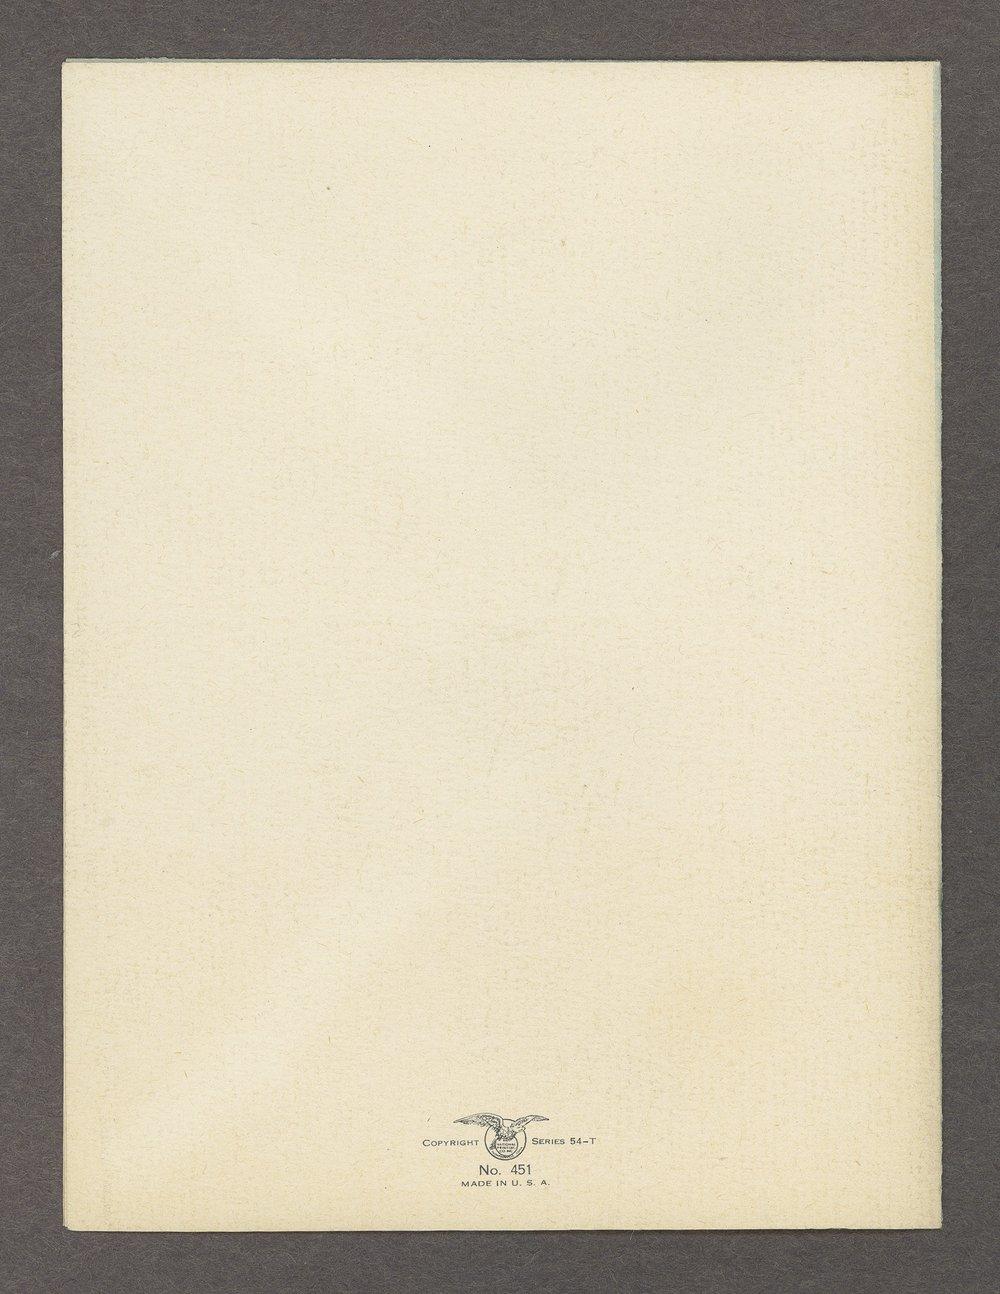 Mary M. Sheldon correspondence - 31